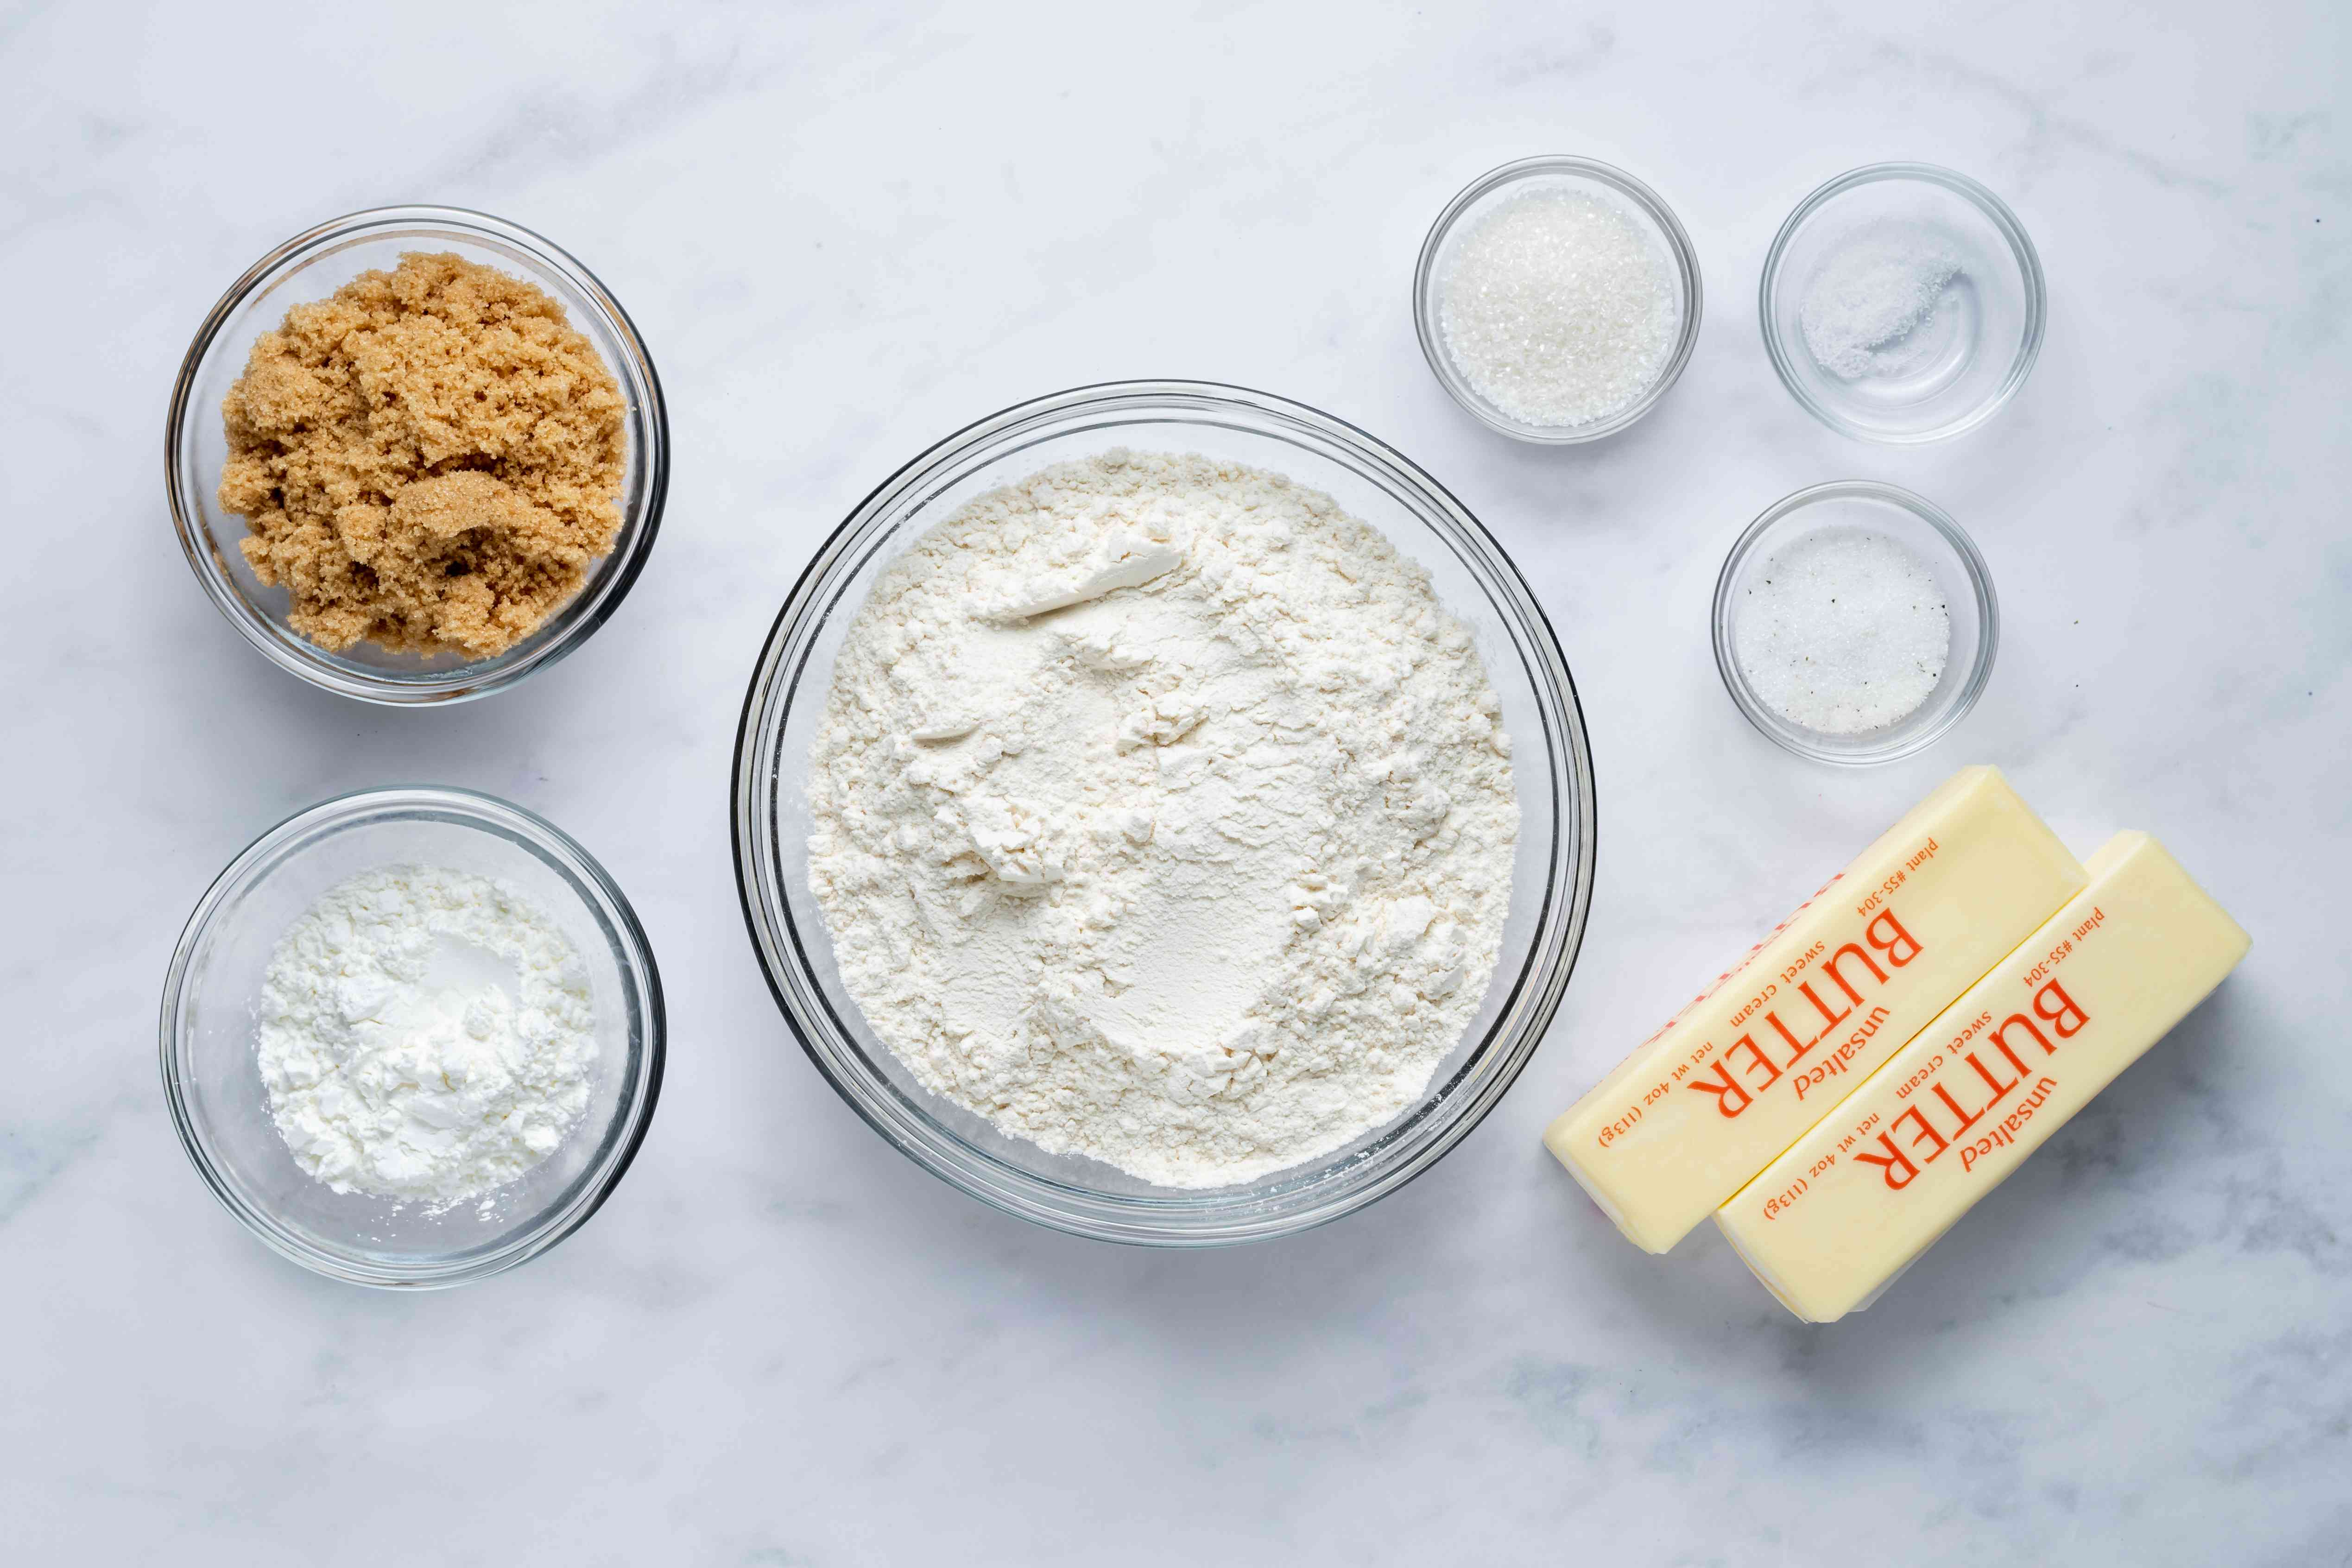 Ingredients for brown sugar shortbread